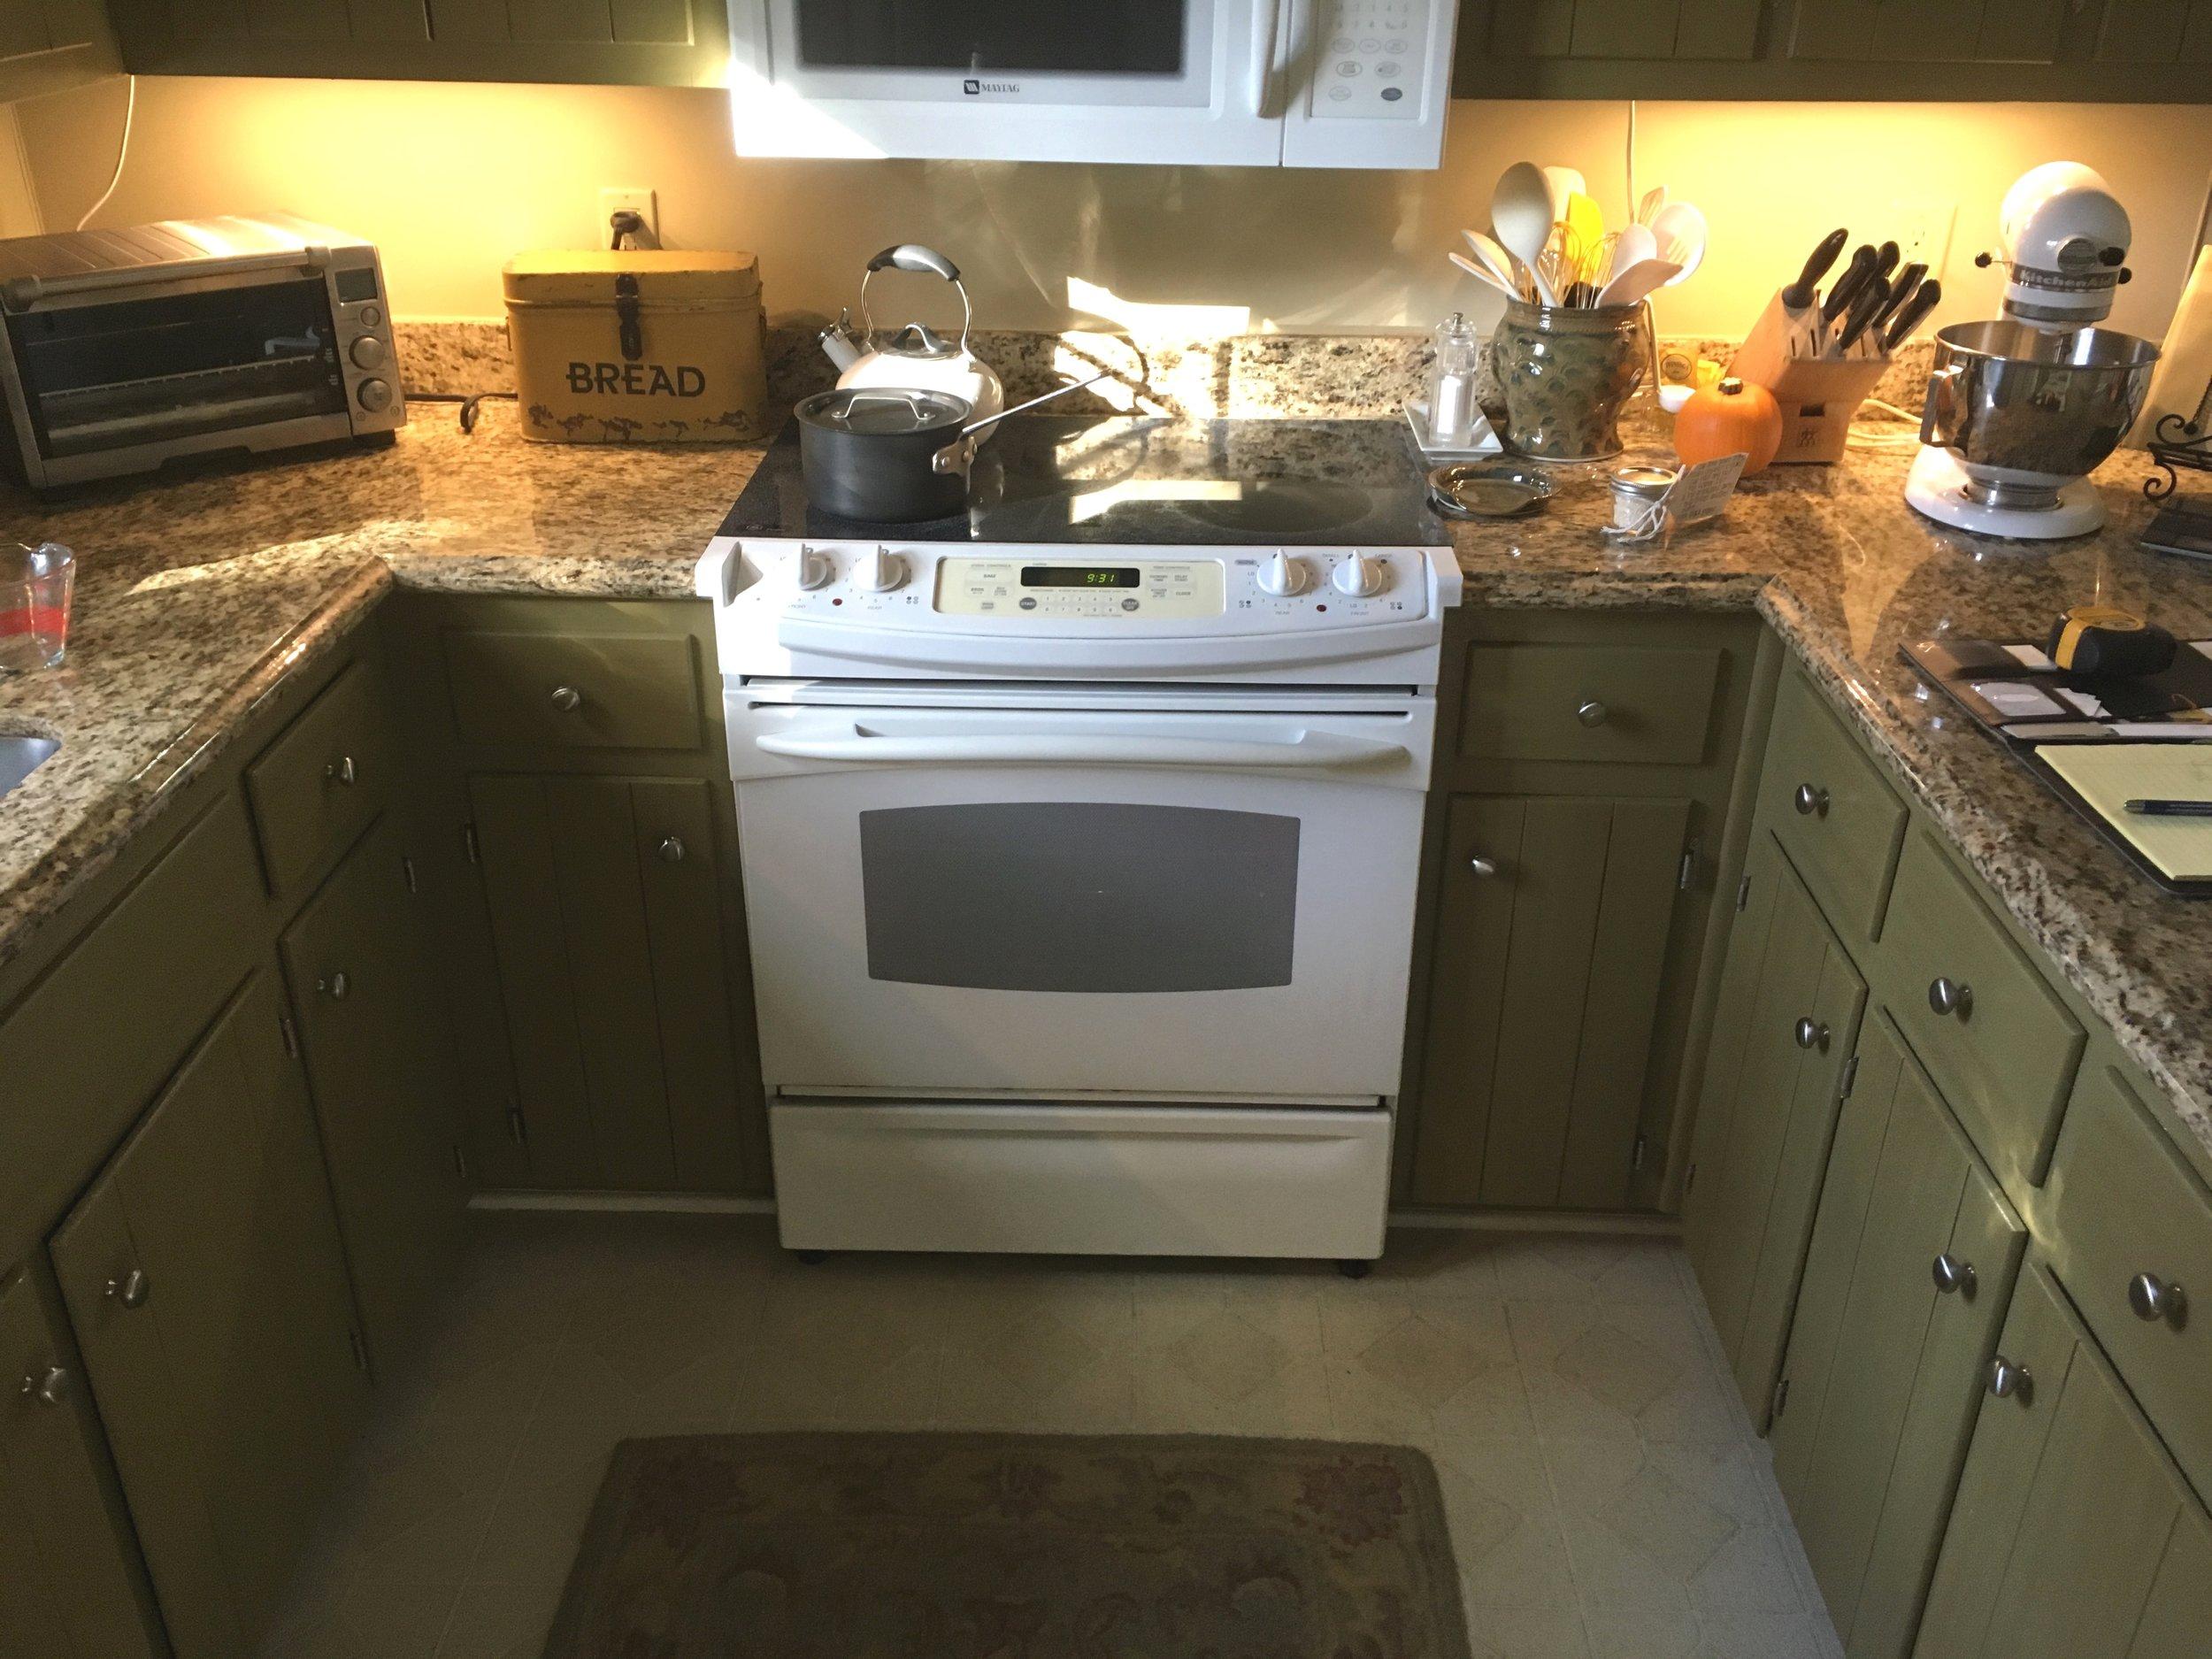 Before: original cabinets, vinyl flooring, white appliances